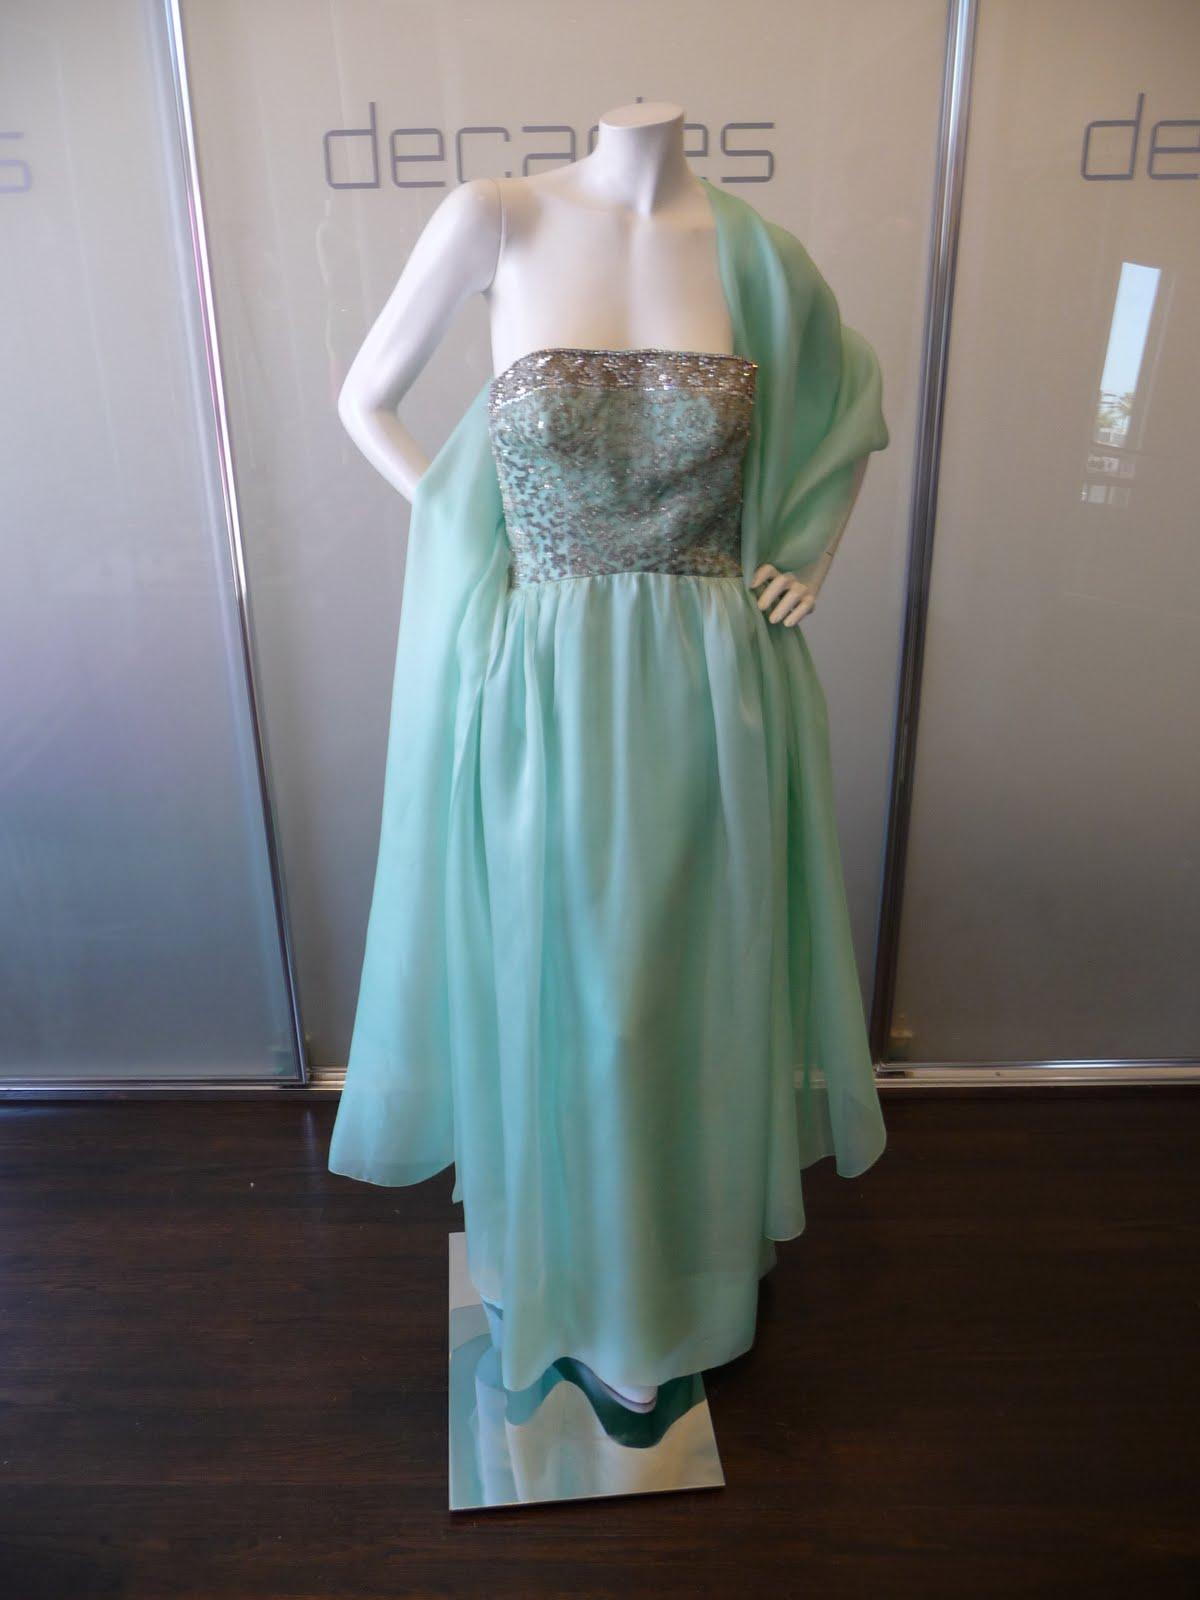 b14ecd640dc3 Cristobal Balenciaga Haute Couture aqua gazar evening gown and stole